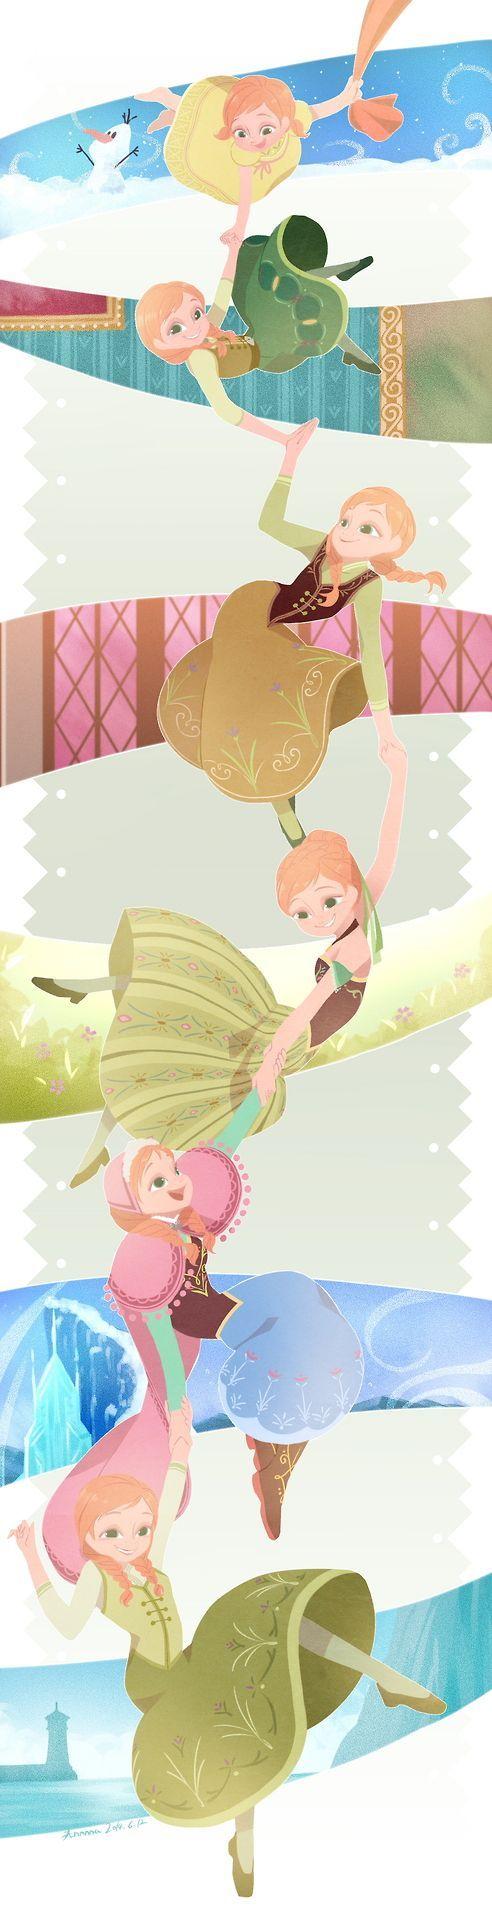 "-créditos en la imagen/credits in the image- "" source: www.pinterest.com """